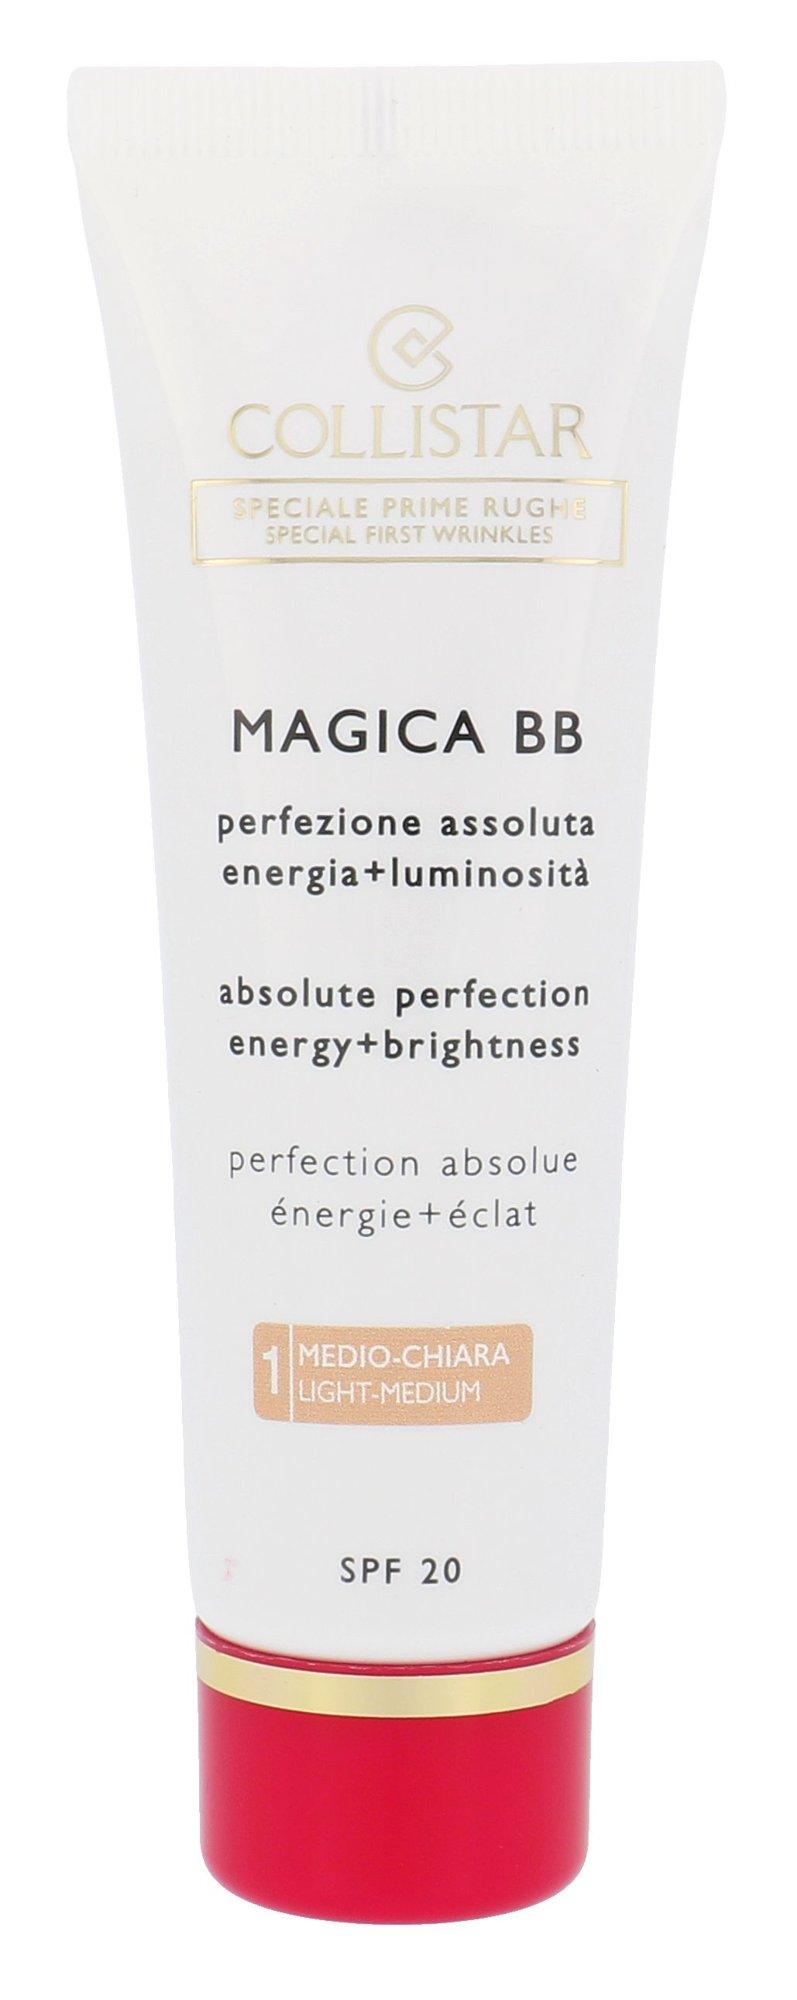 Collistar Special First Wrinkles Cosmetic 50ml 1 Light Medium